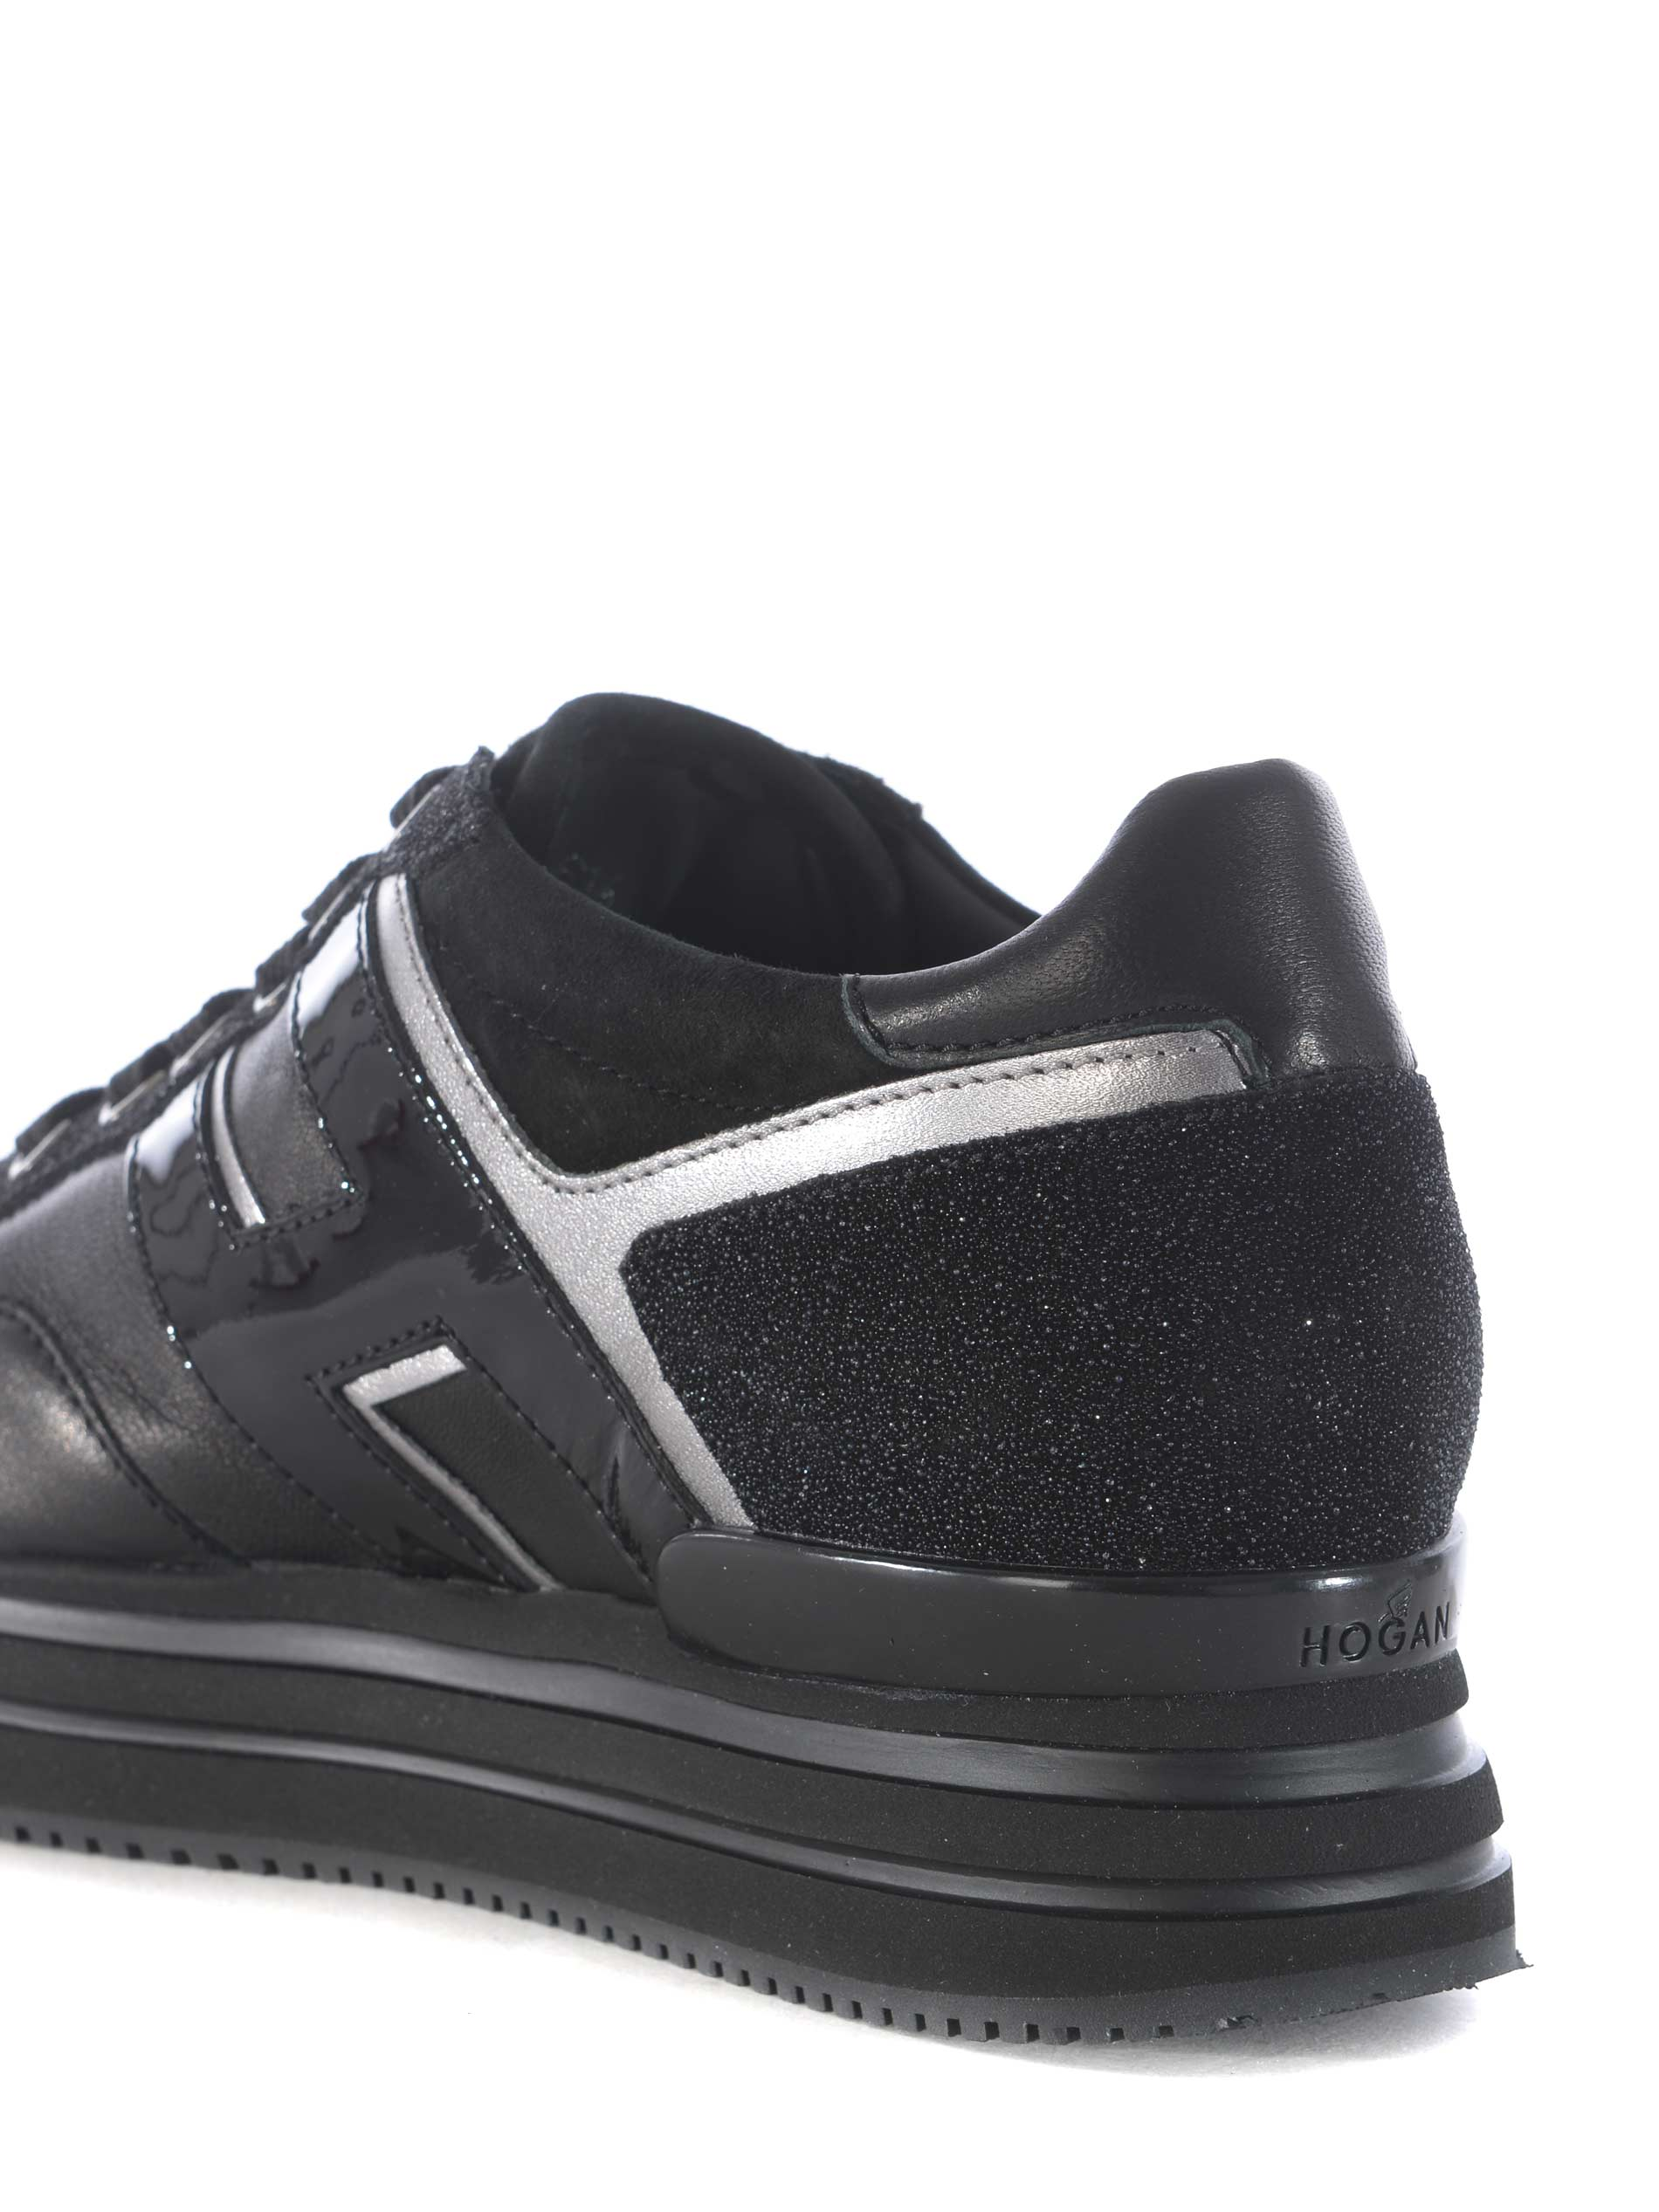 Sneakers donna Midi Platform H222 Hogan in pelle - HOGAN - TufanoModa